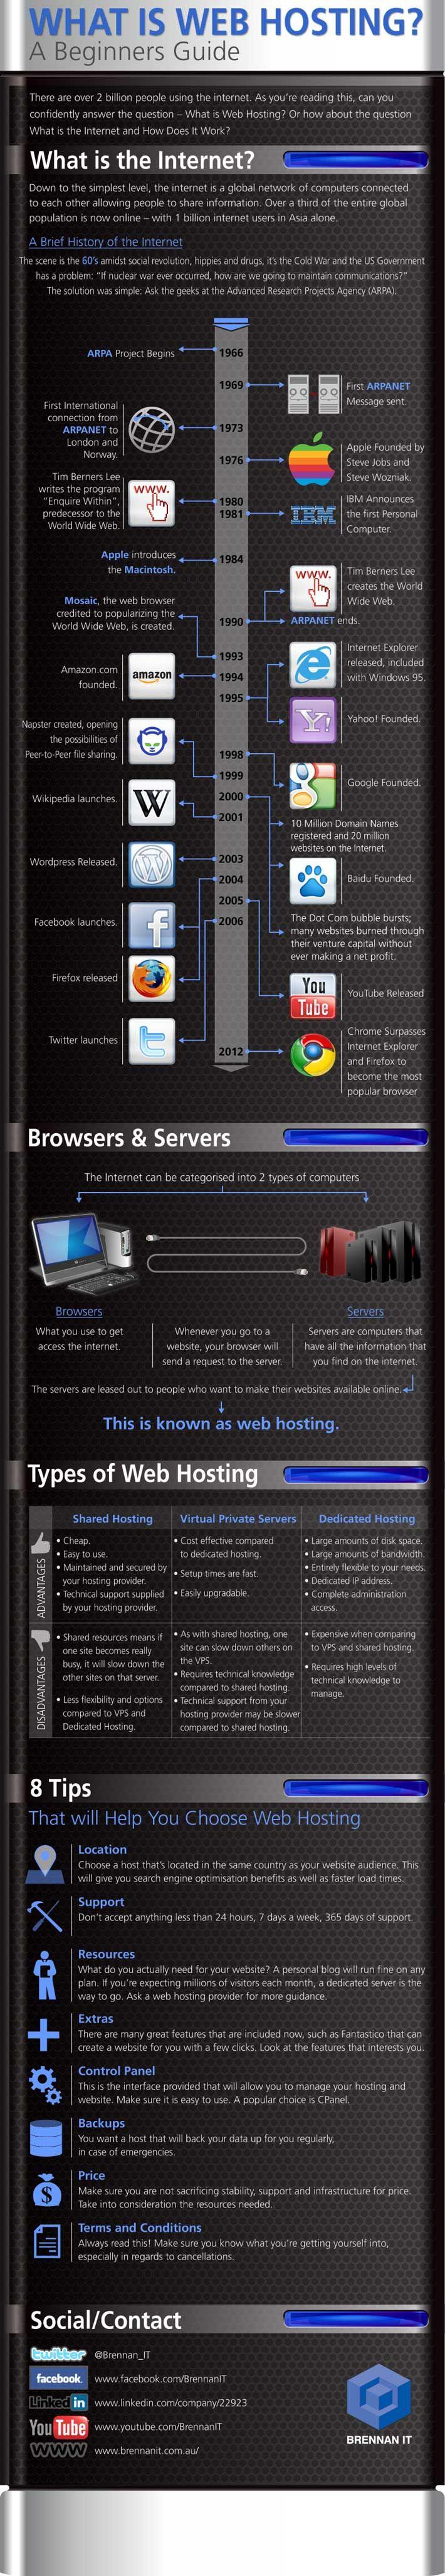 Web Hosting 2013 Best Web Hosting